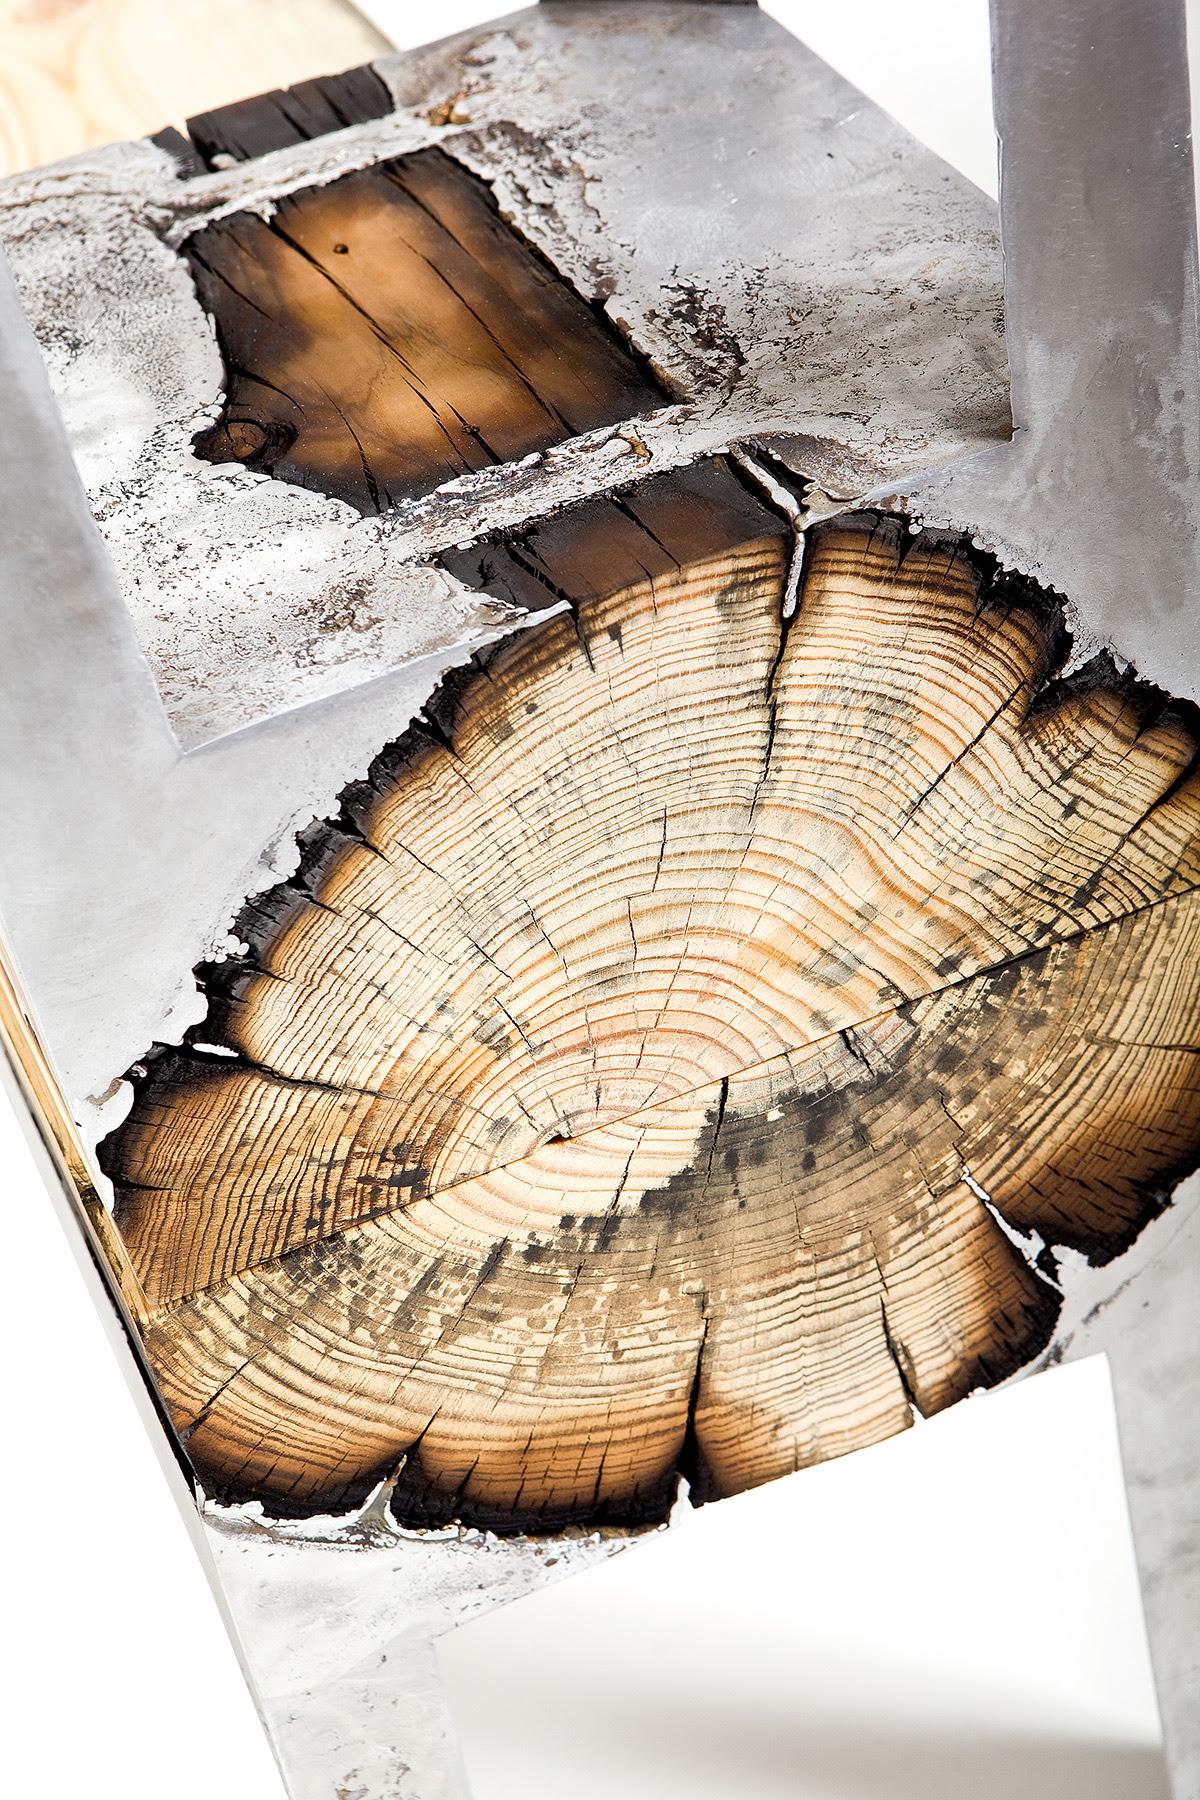 Designer Hilla Shamia Fuses Cast Aluminum and Tree Trunks to Create One of a Kind Furniture Pieces wood furniture aluminum